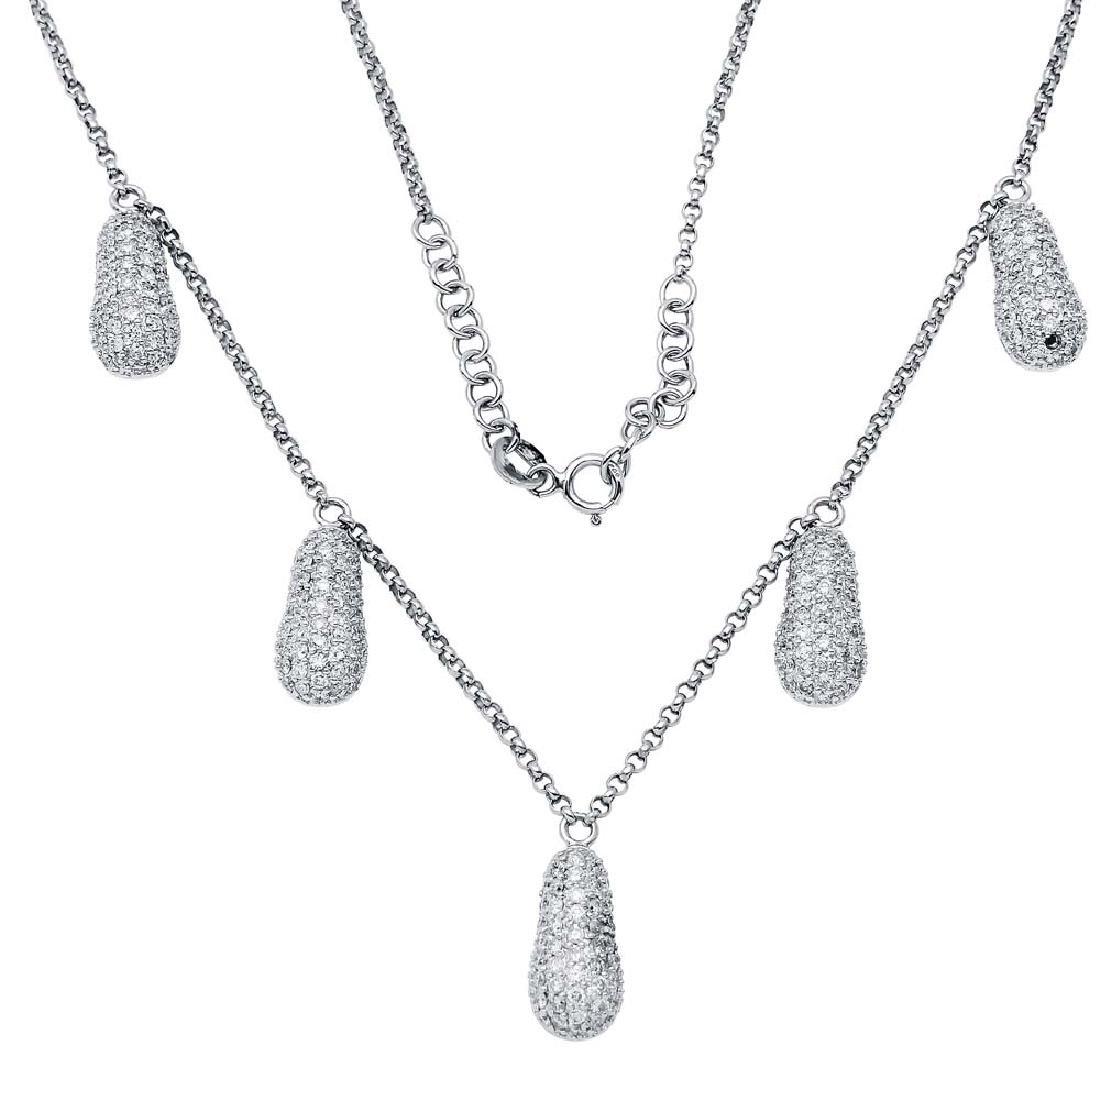 Genuine 2.17 TCW 18K White Gold Ladies Necklace